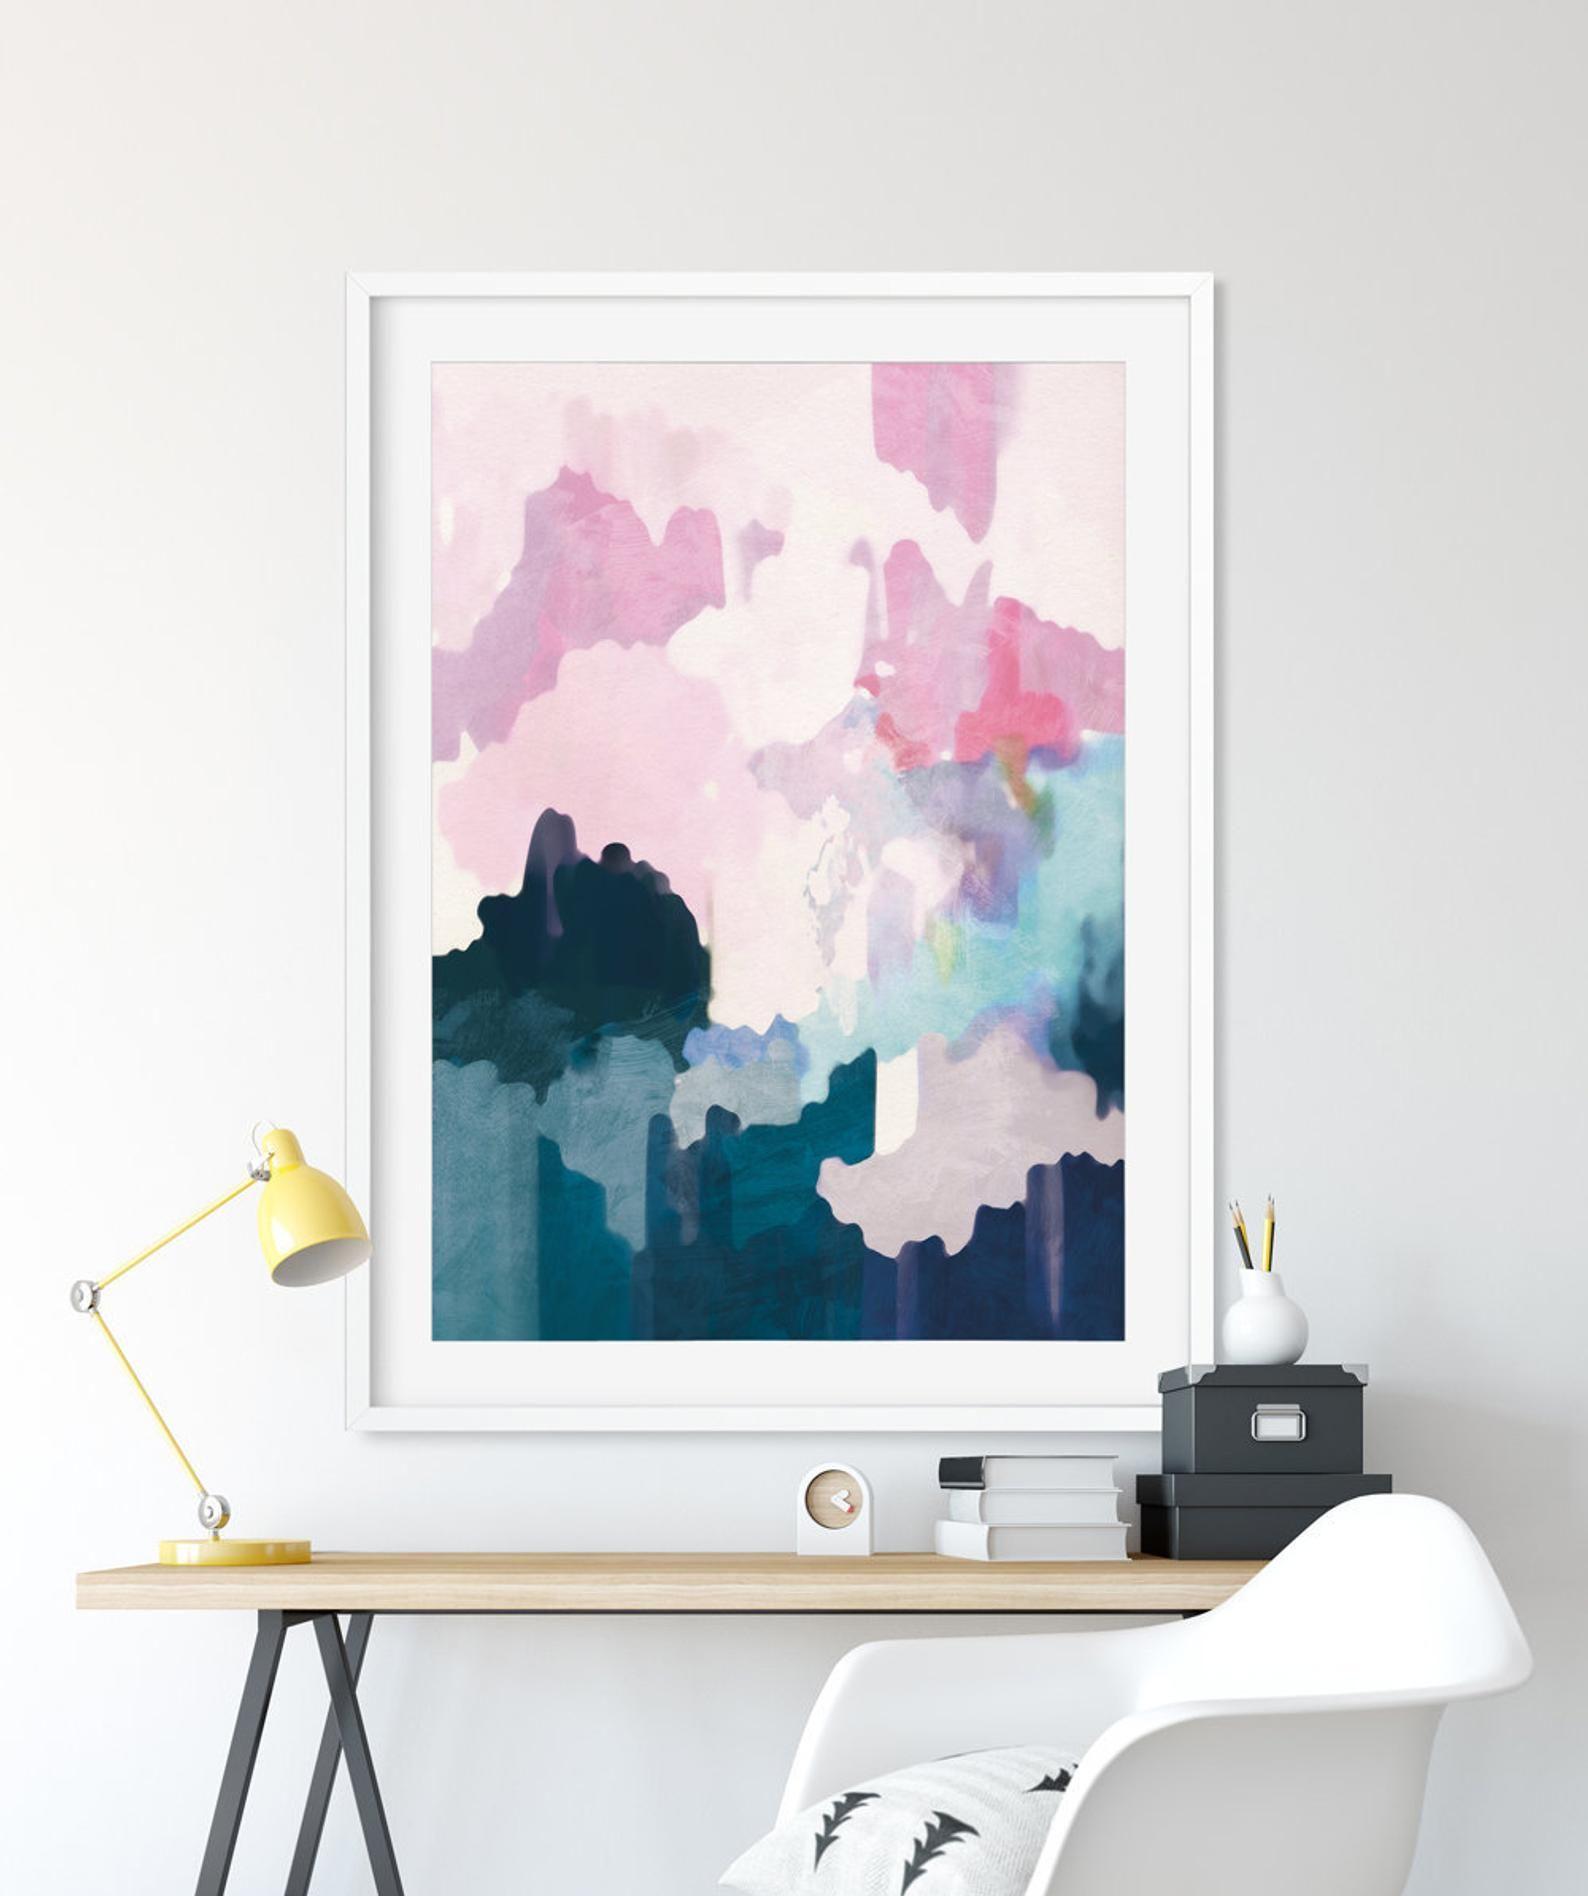 Large Abstract Art Printable Abstract Wall Art 24x36 Print Etsy In 2020 Pink Wall Art Pink Walls Abstract Wall Art